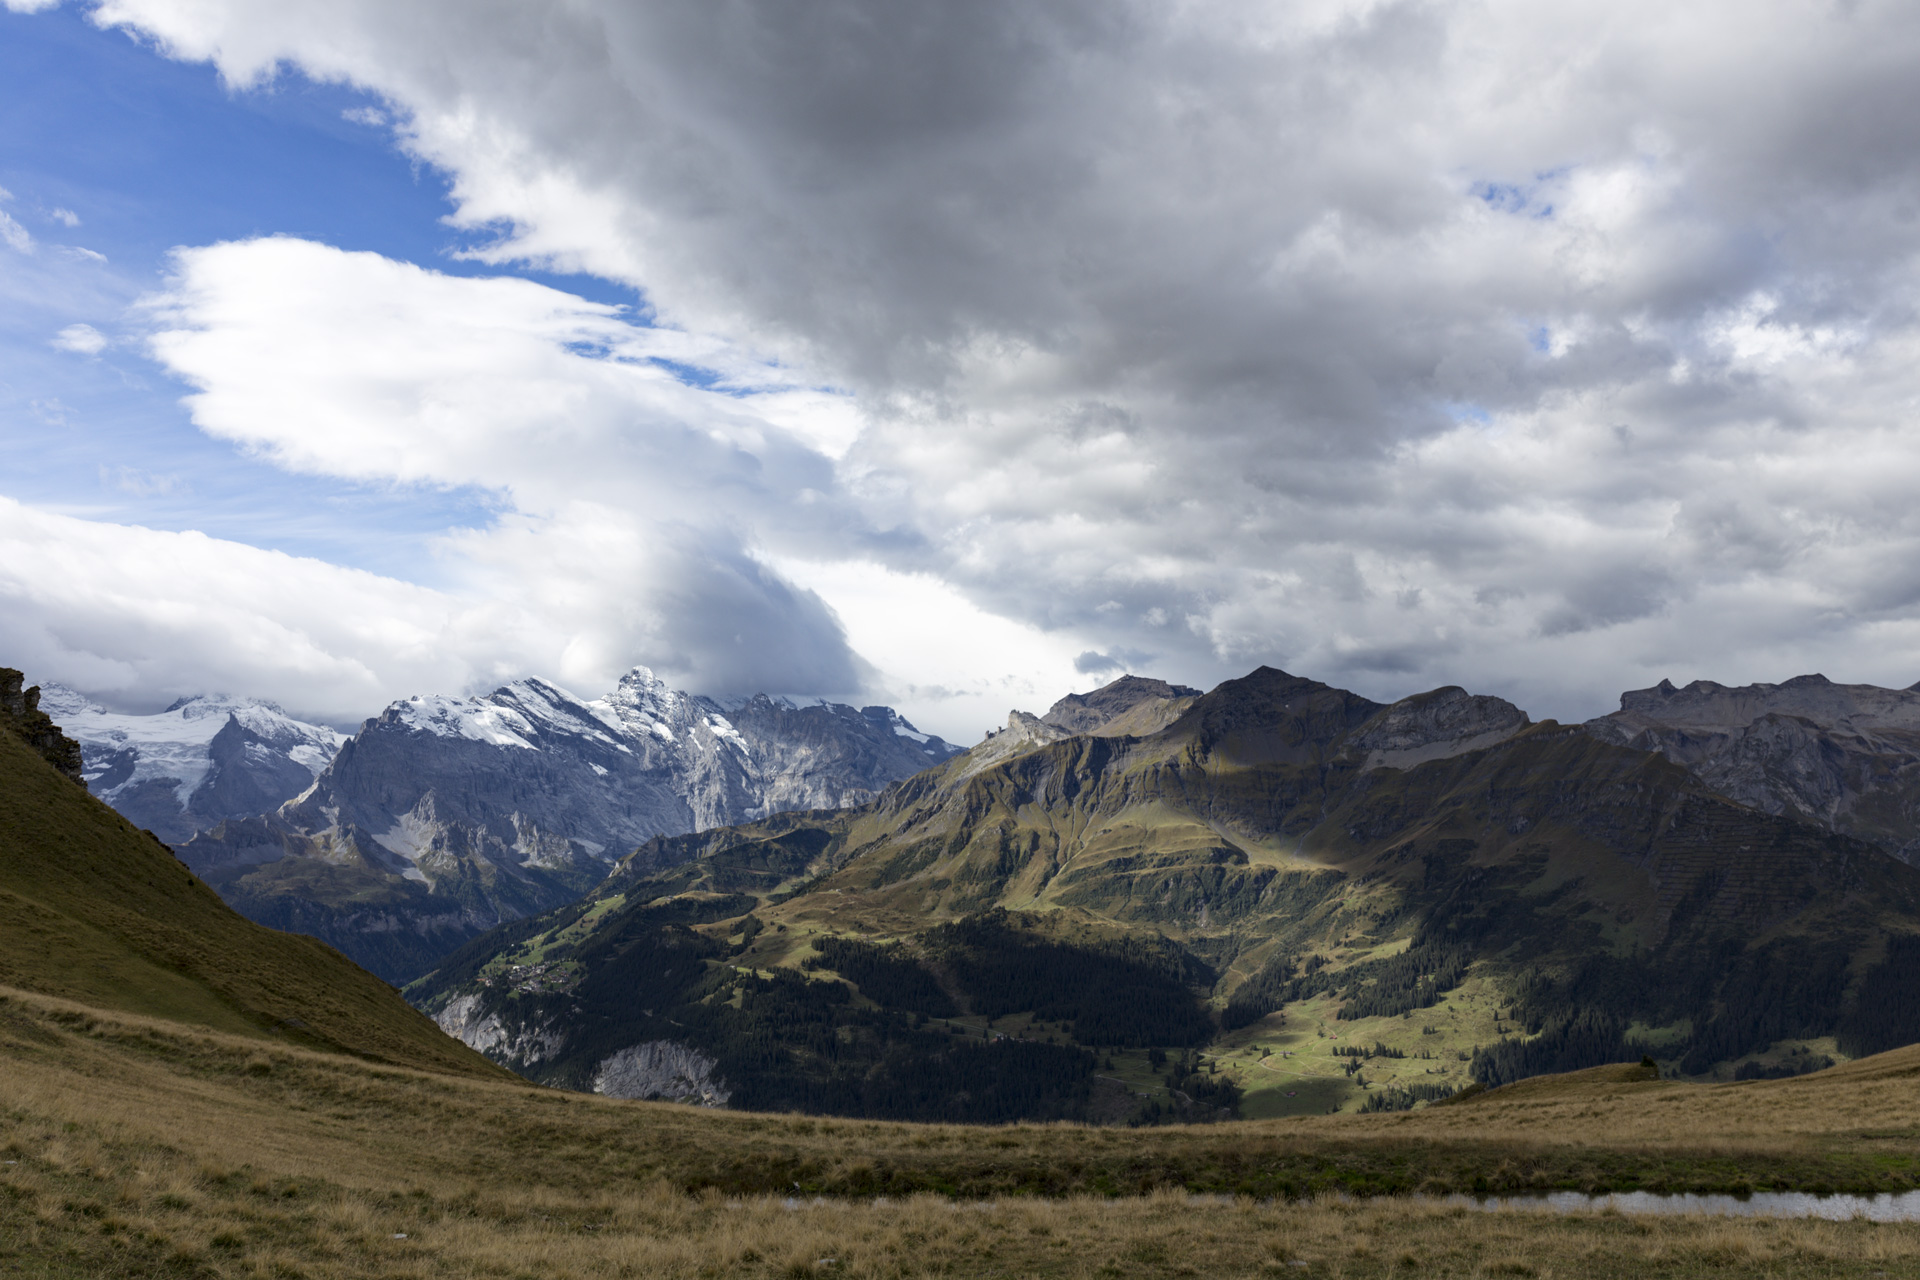 Berner-Oberland_20150916_0033-1